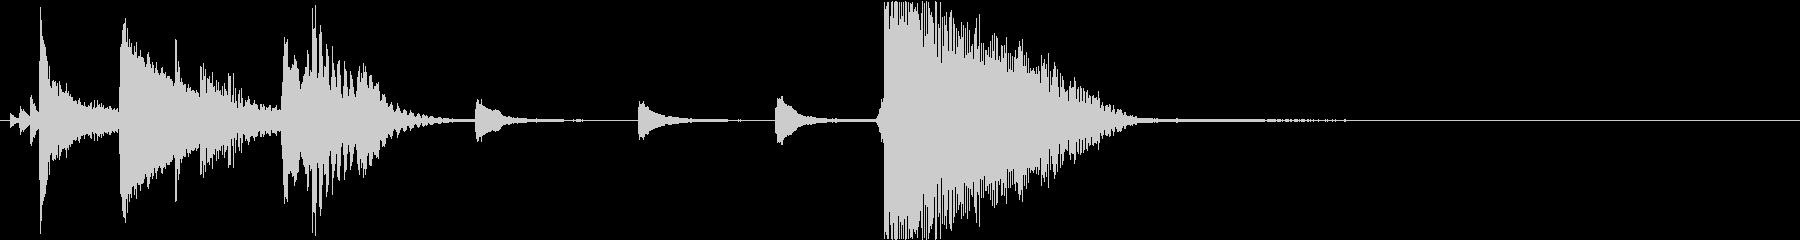 Jazzyなロゴ イメージ プレゼン映像の未再生の波形